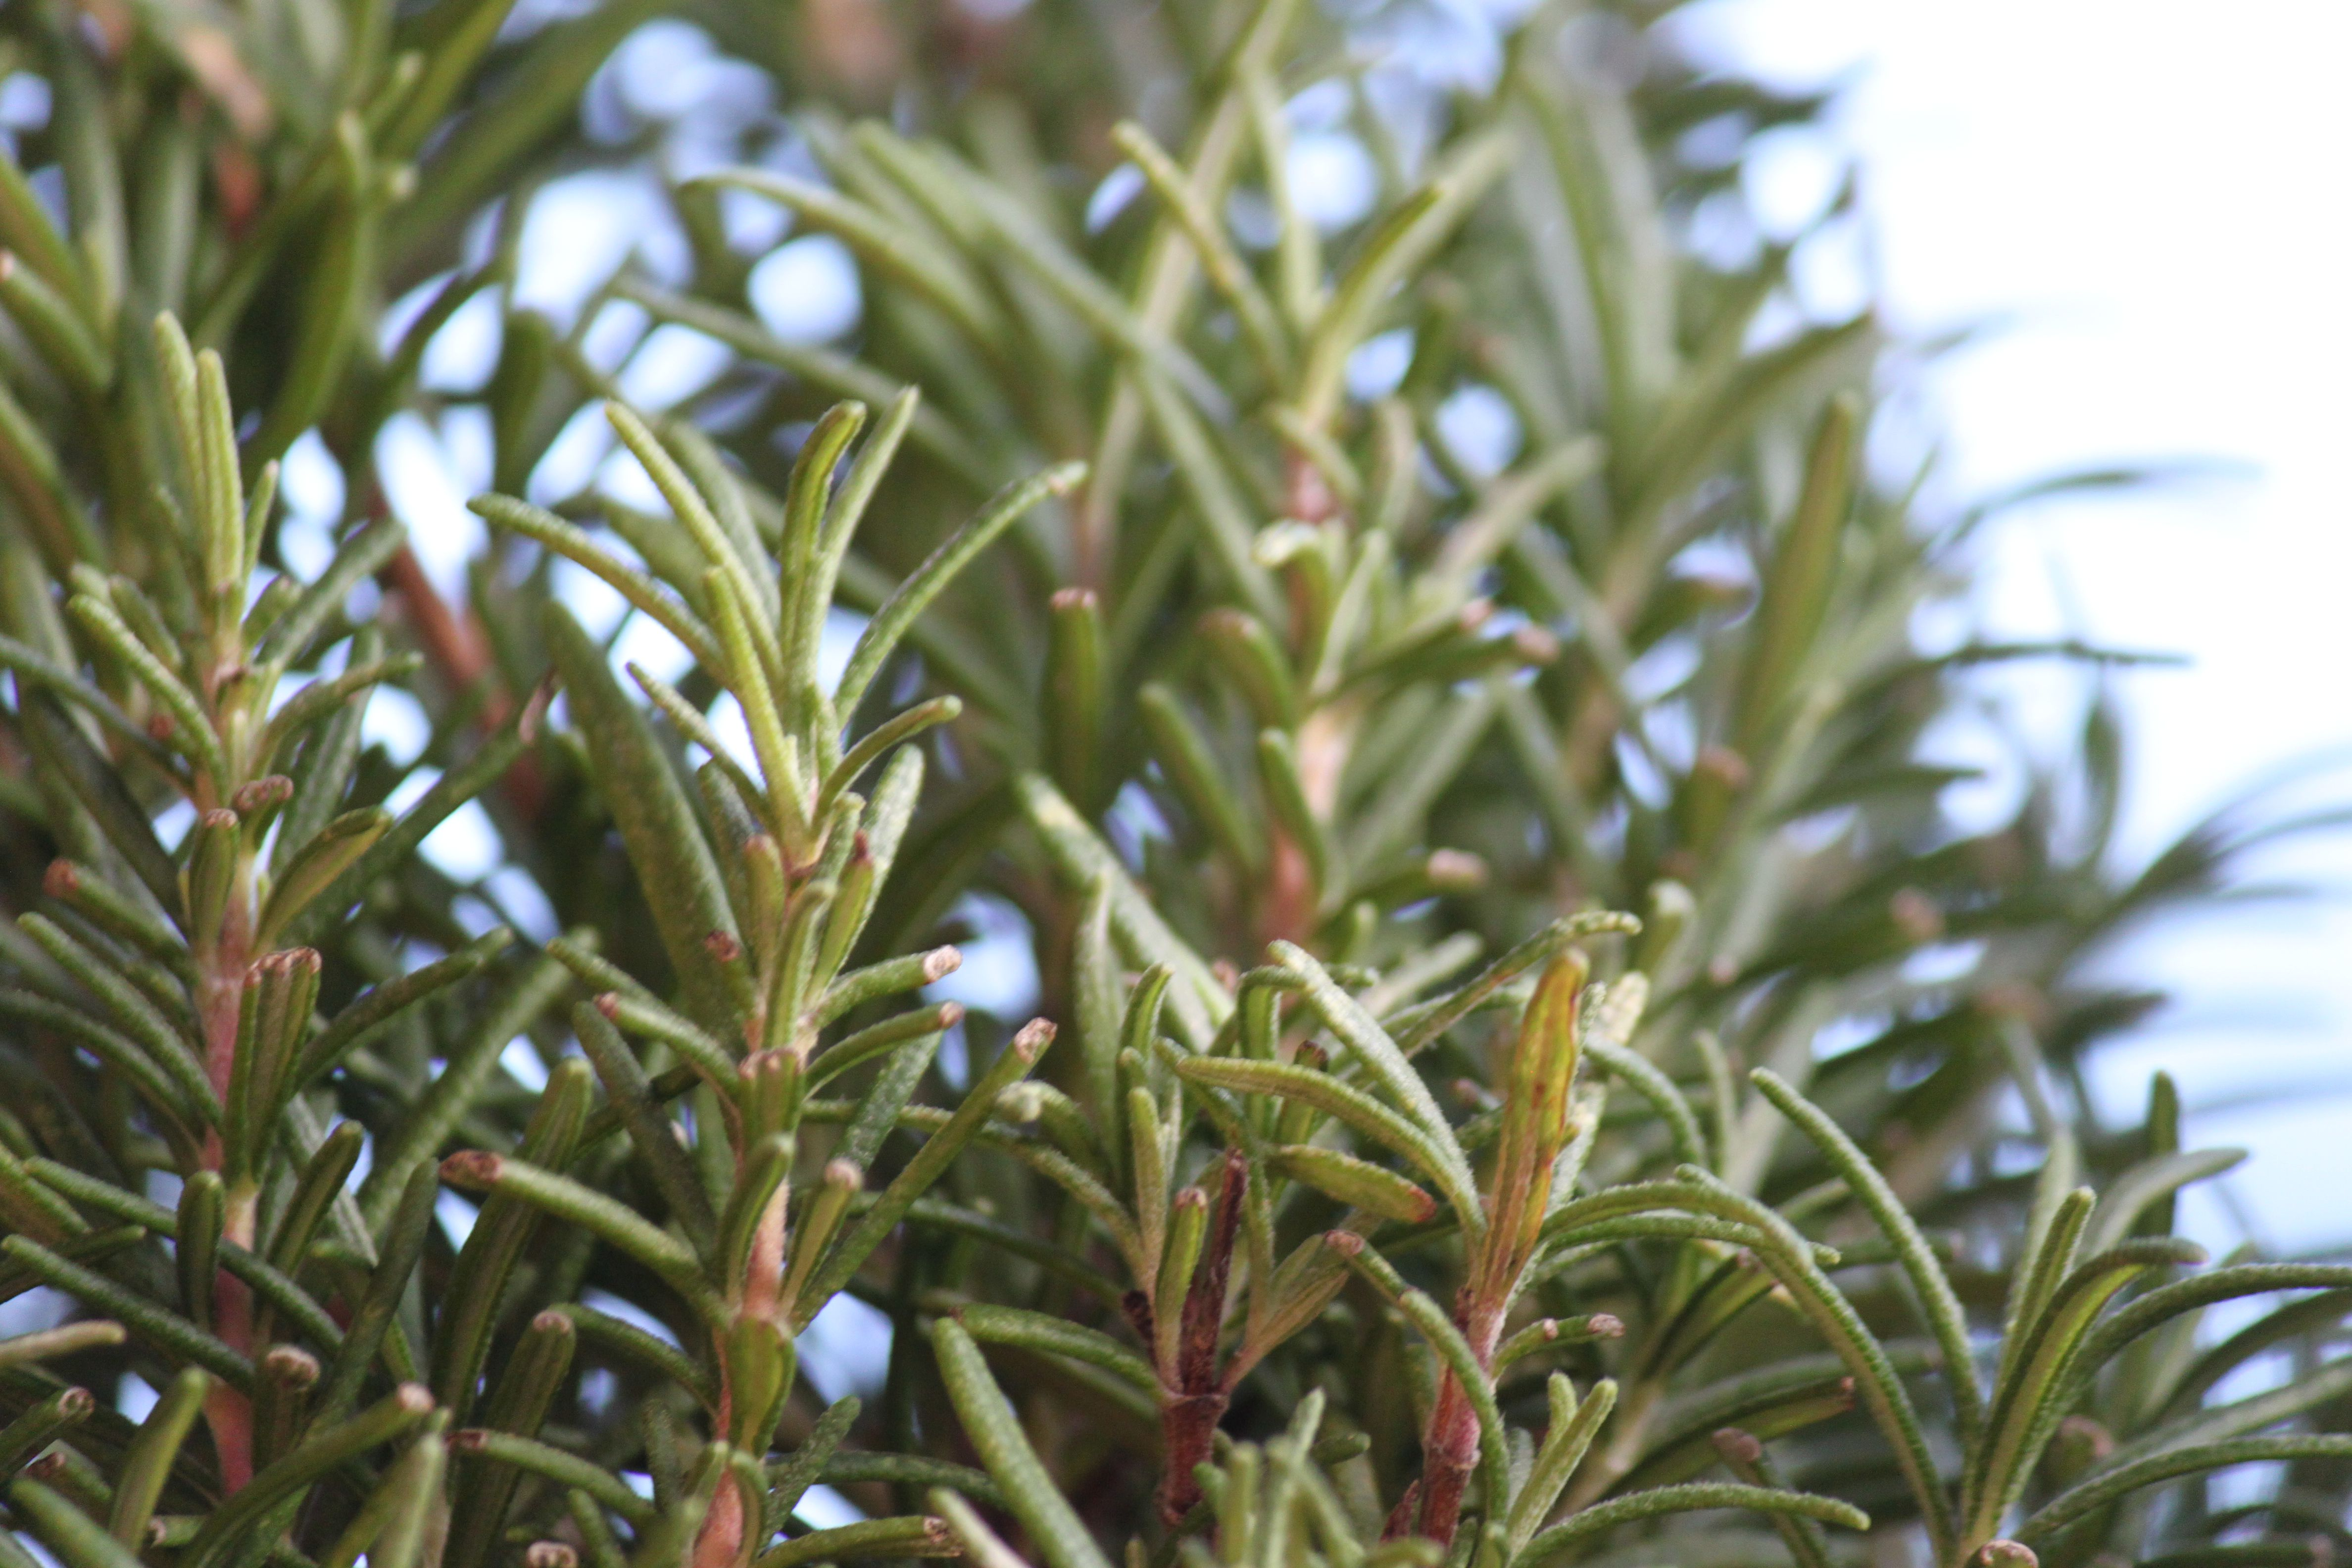 Rosemary Herb Plant